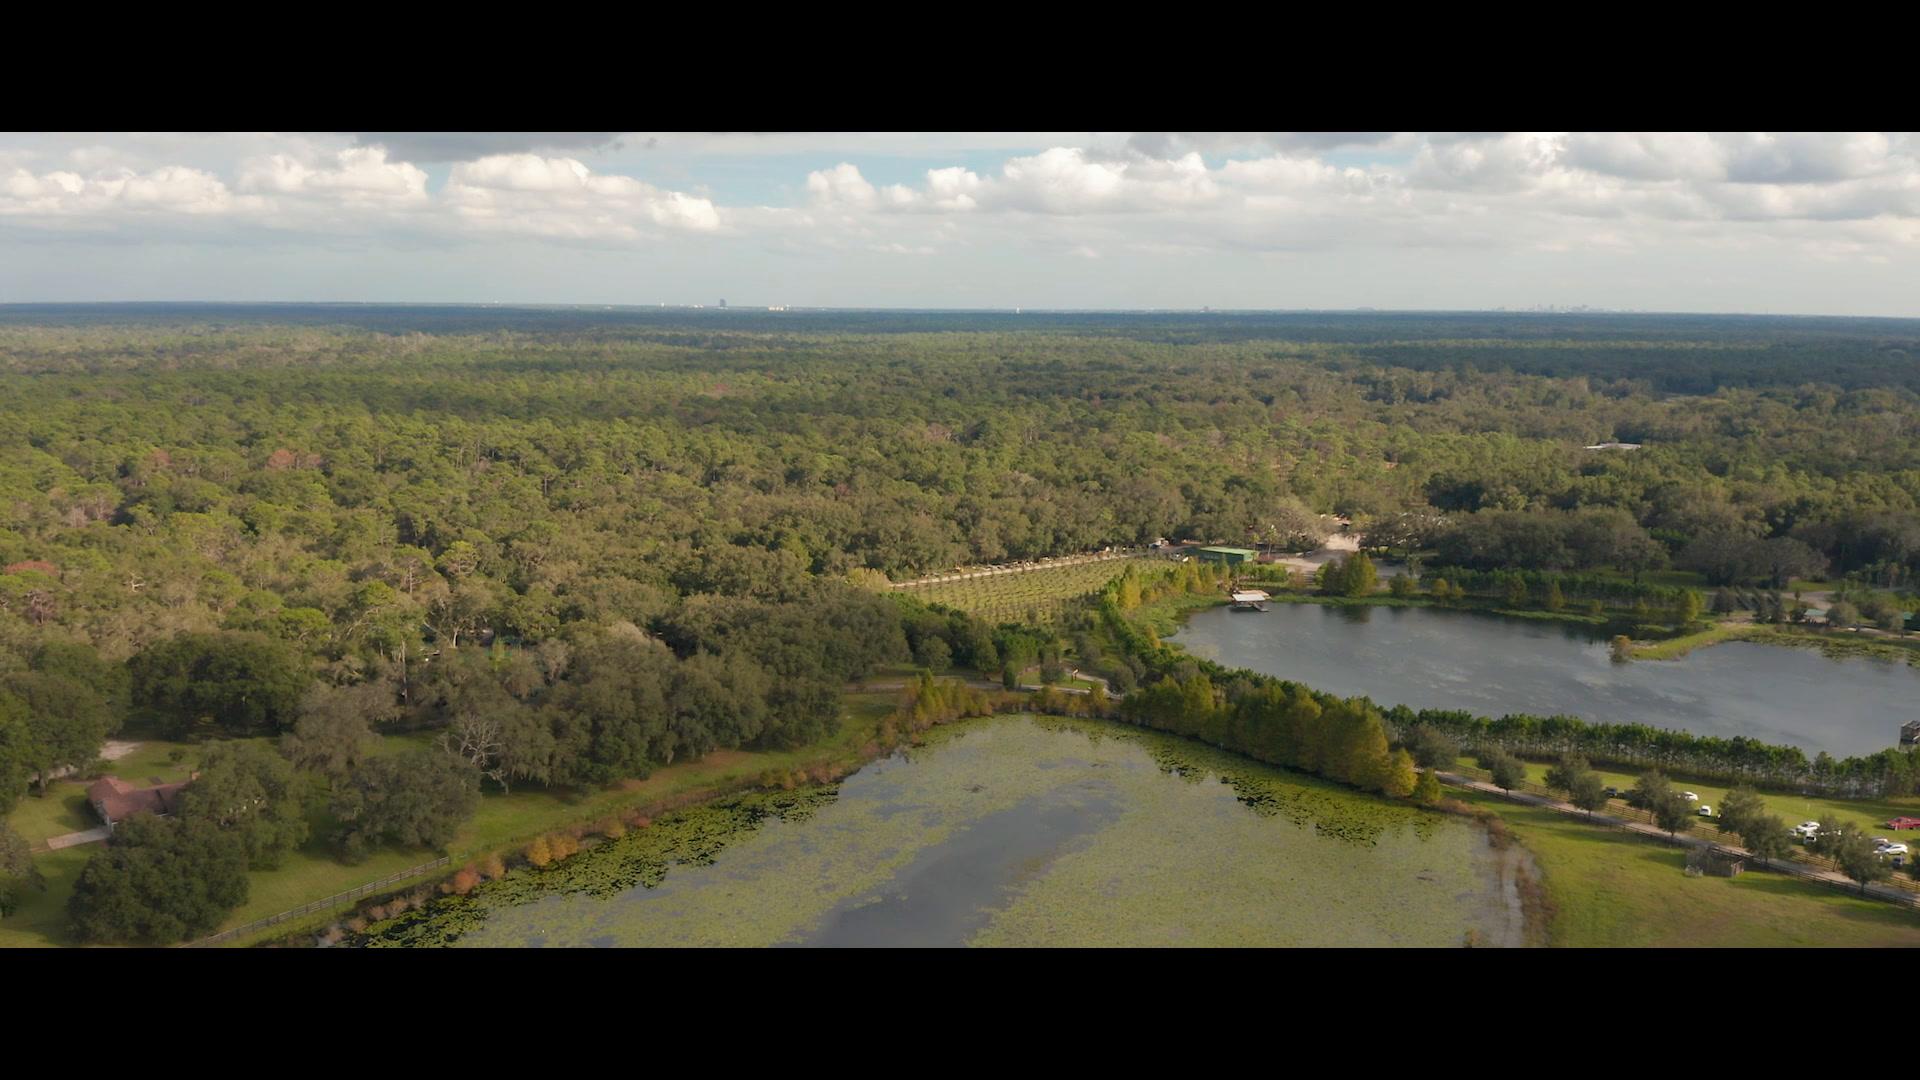 Candace + Mikell | Apopka, Florida | Club Lake Plantation